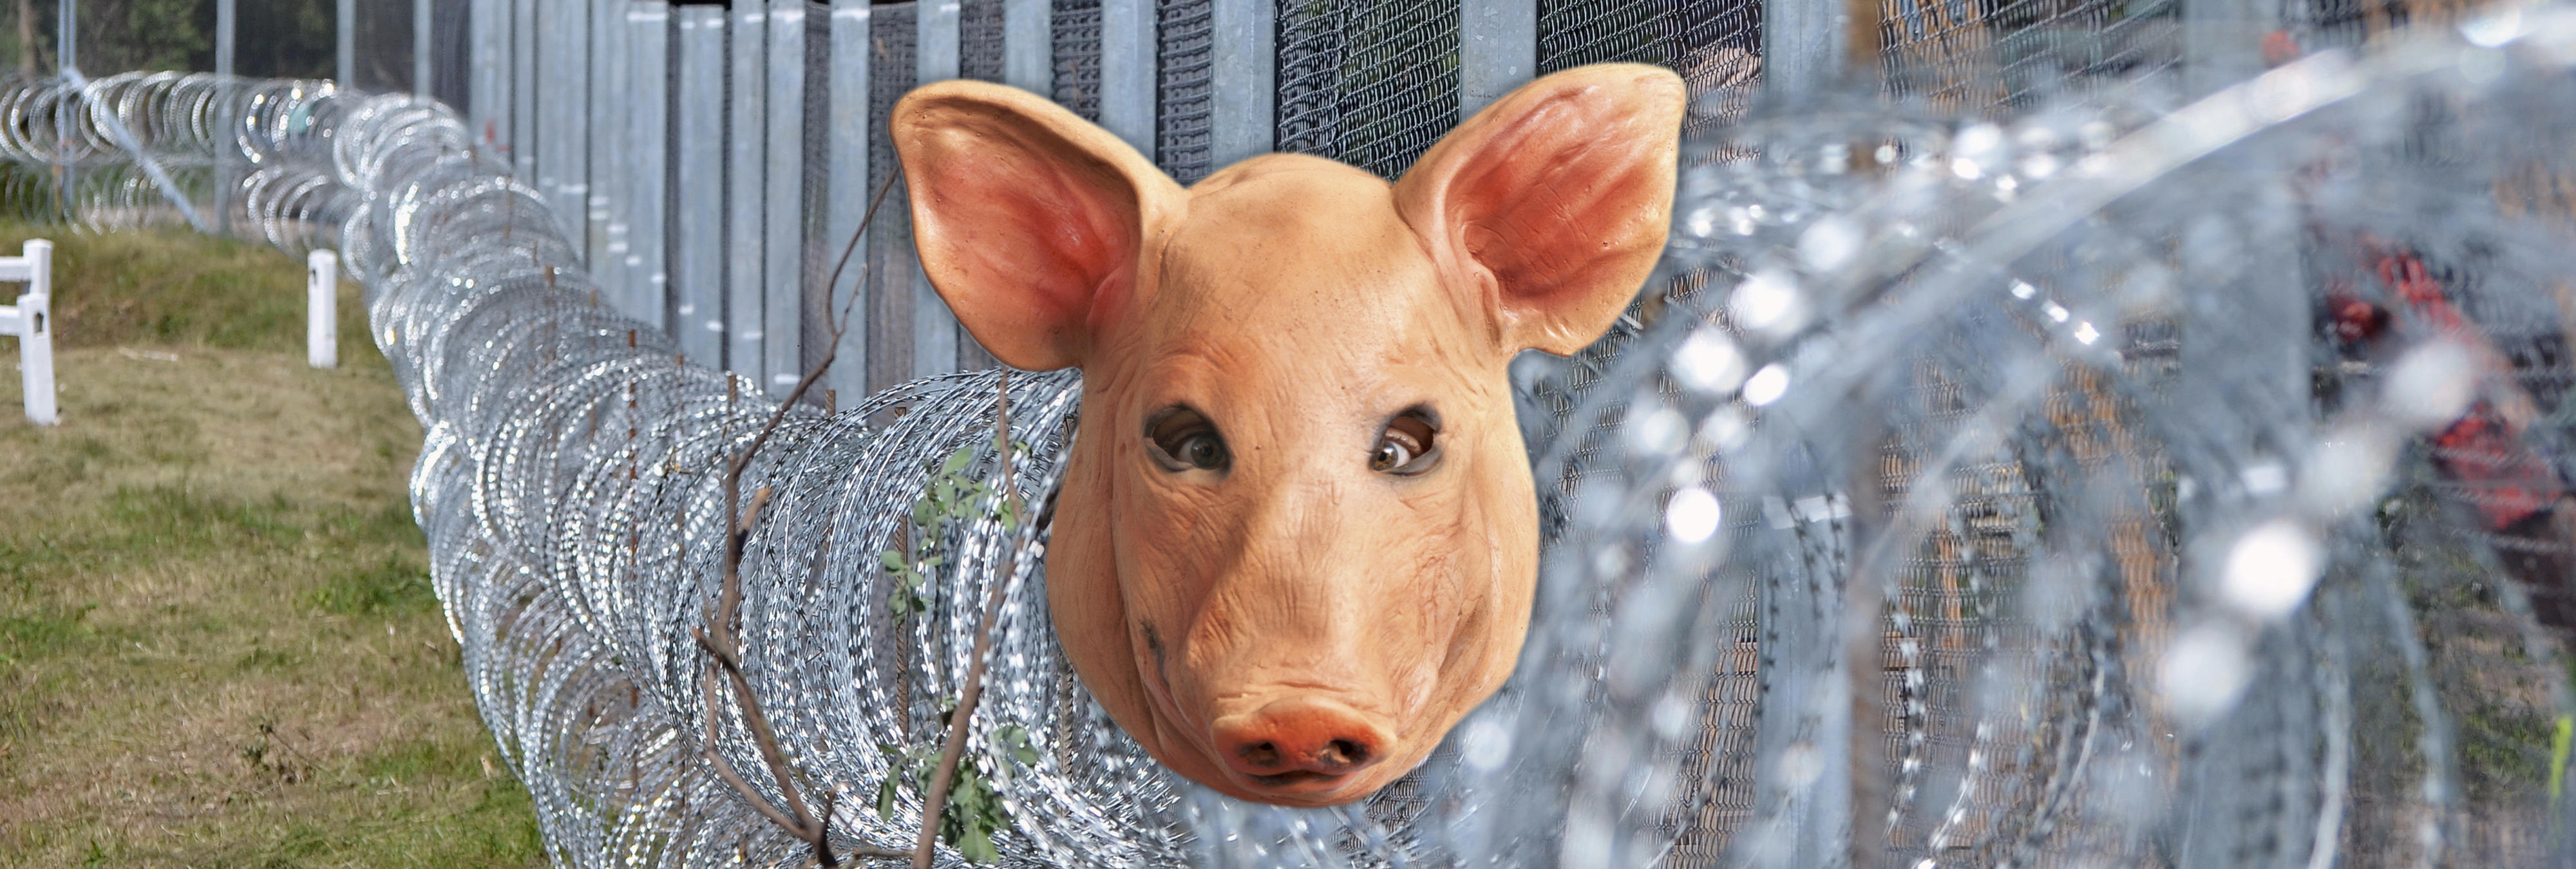 Un eurodiputado húngaro propone colgar cabezas de cerdo en las fronteras para repeler refugiados